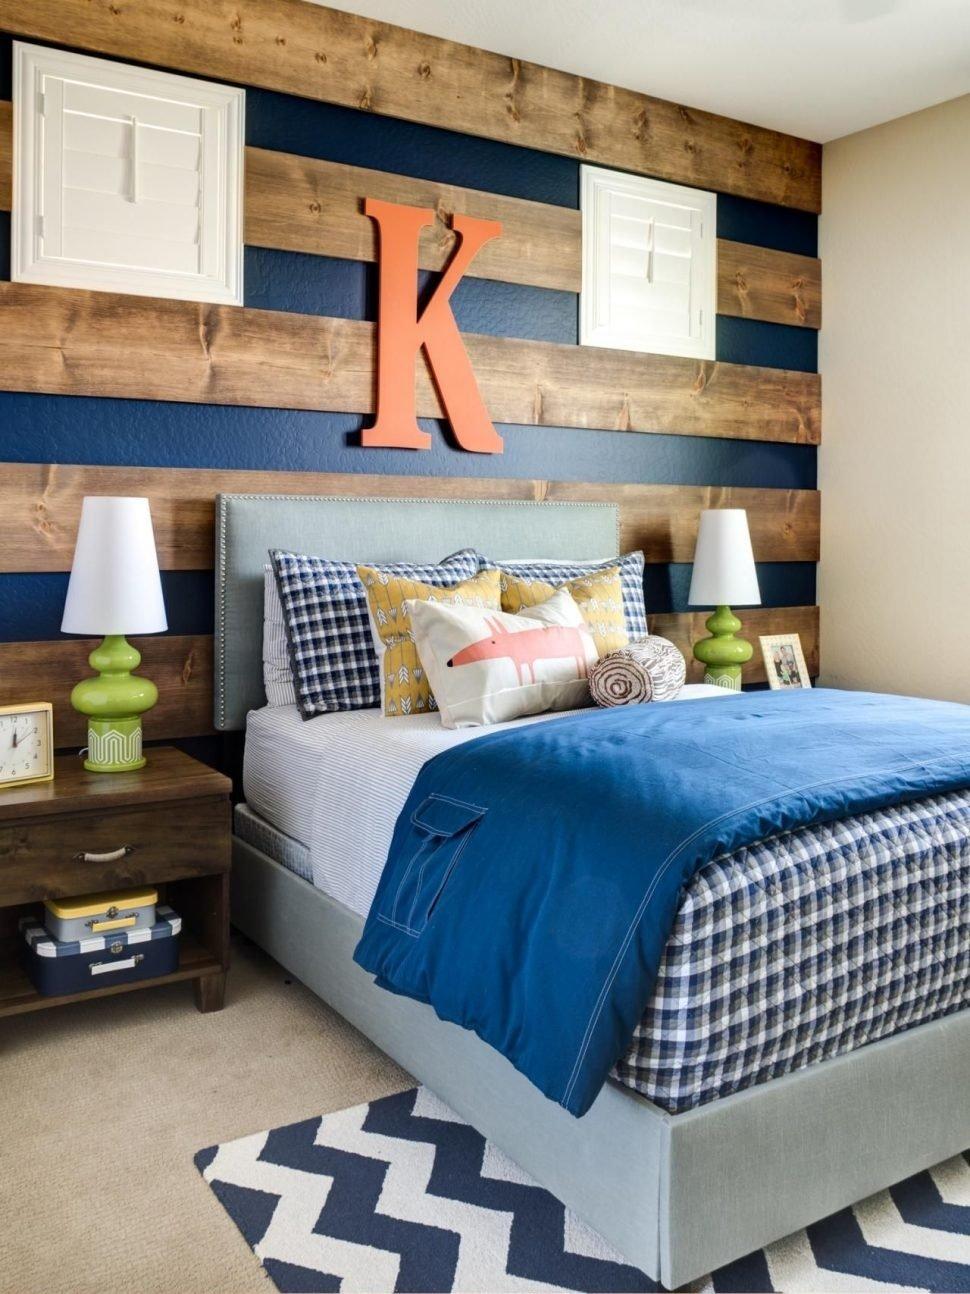 10 Pretty 10 Year Old Bedroom Ideas bedroom handsome 4yr old boy bedroom ideas bedrooms year 2020